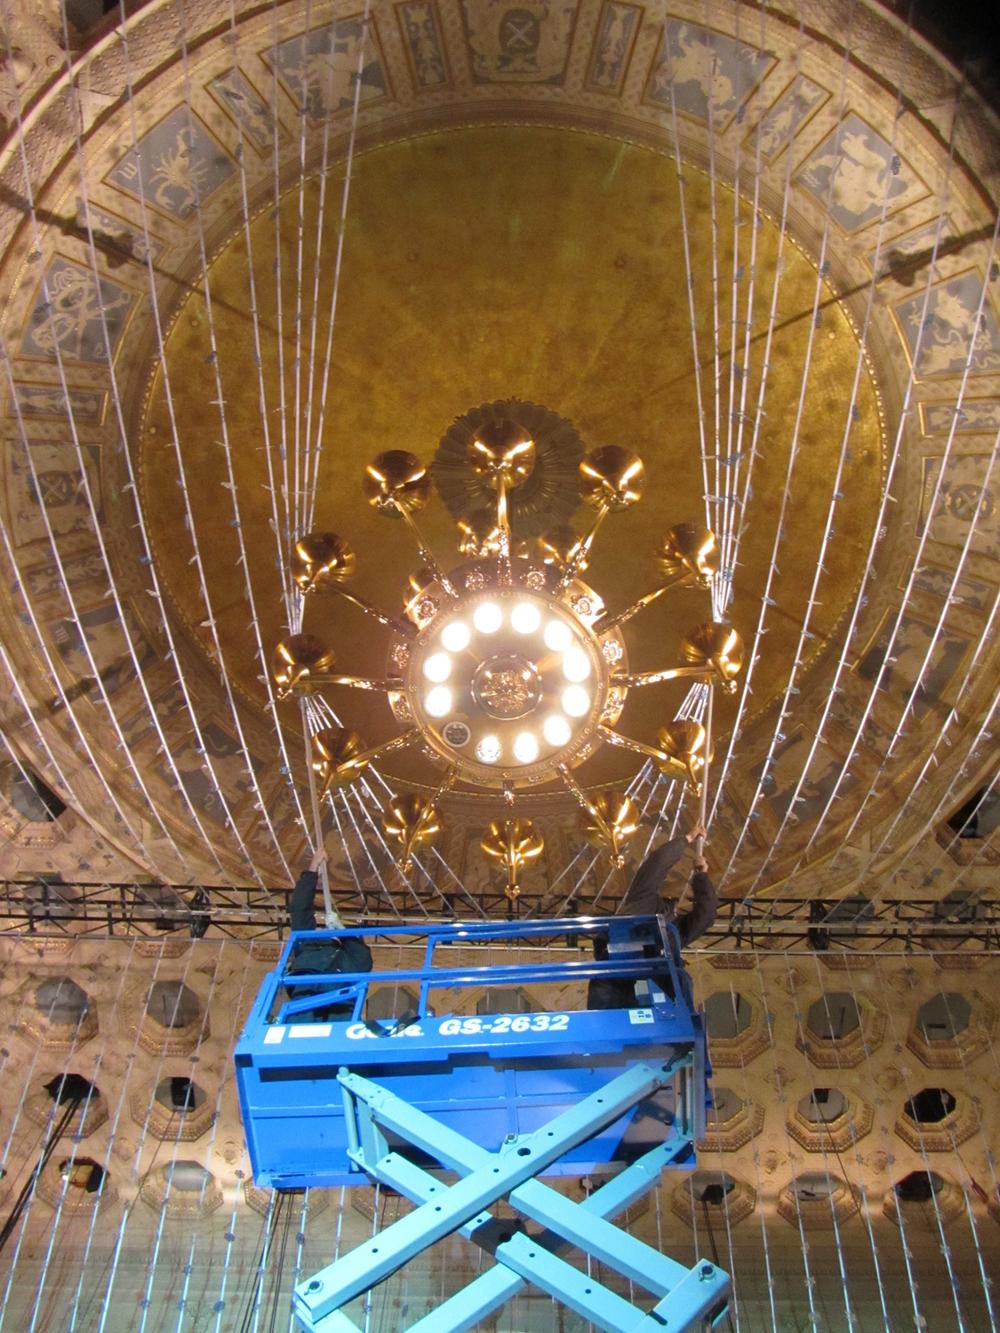 Negotiating the chandelier